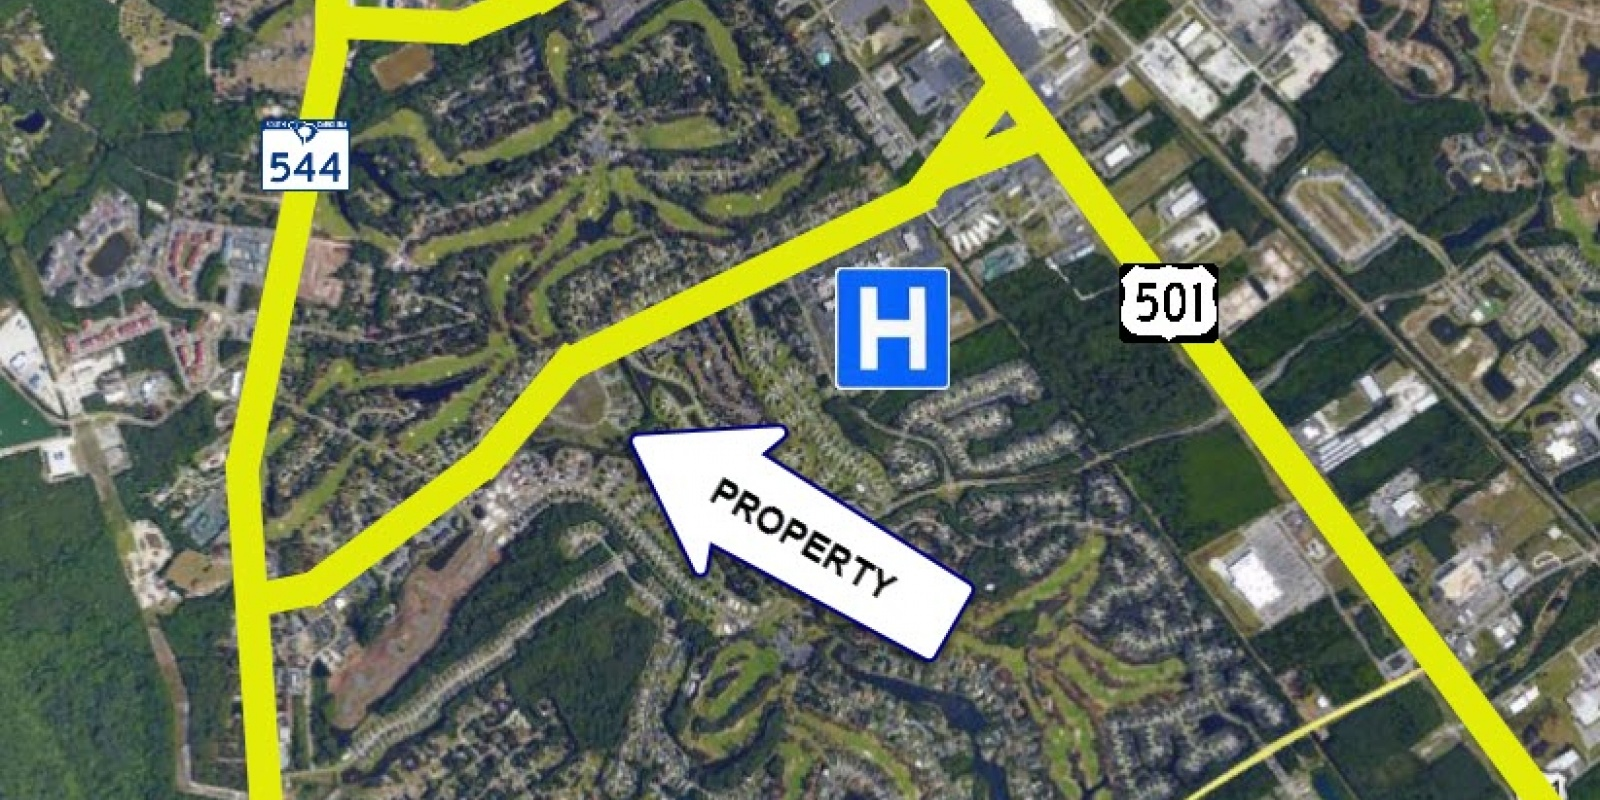 TBD Professional Park Drive,Conway,South Carolina,29526,Office / Medical,Singelton Ridge Business Park,Professional Park Drive,1351